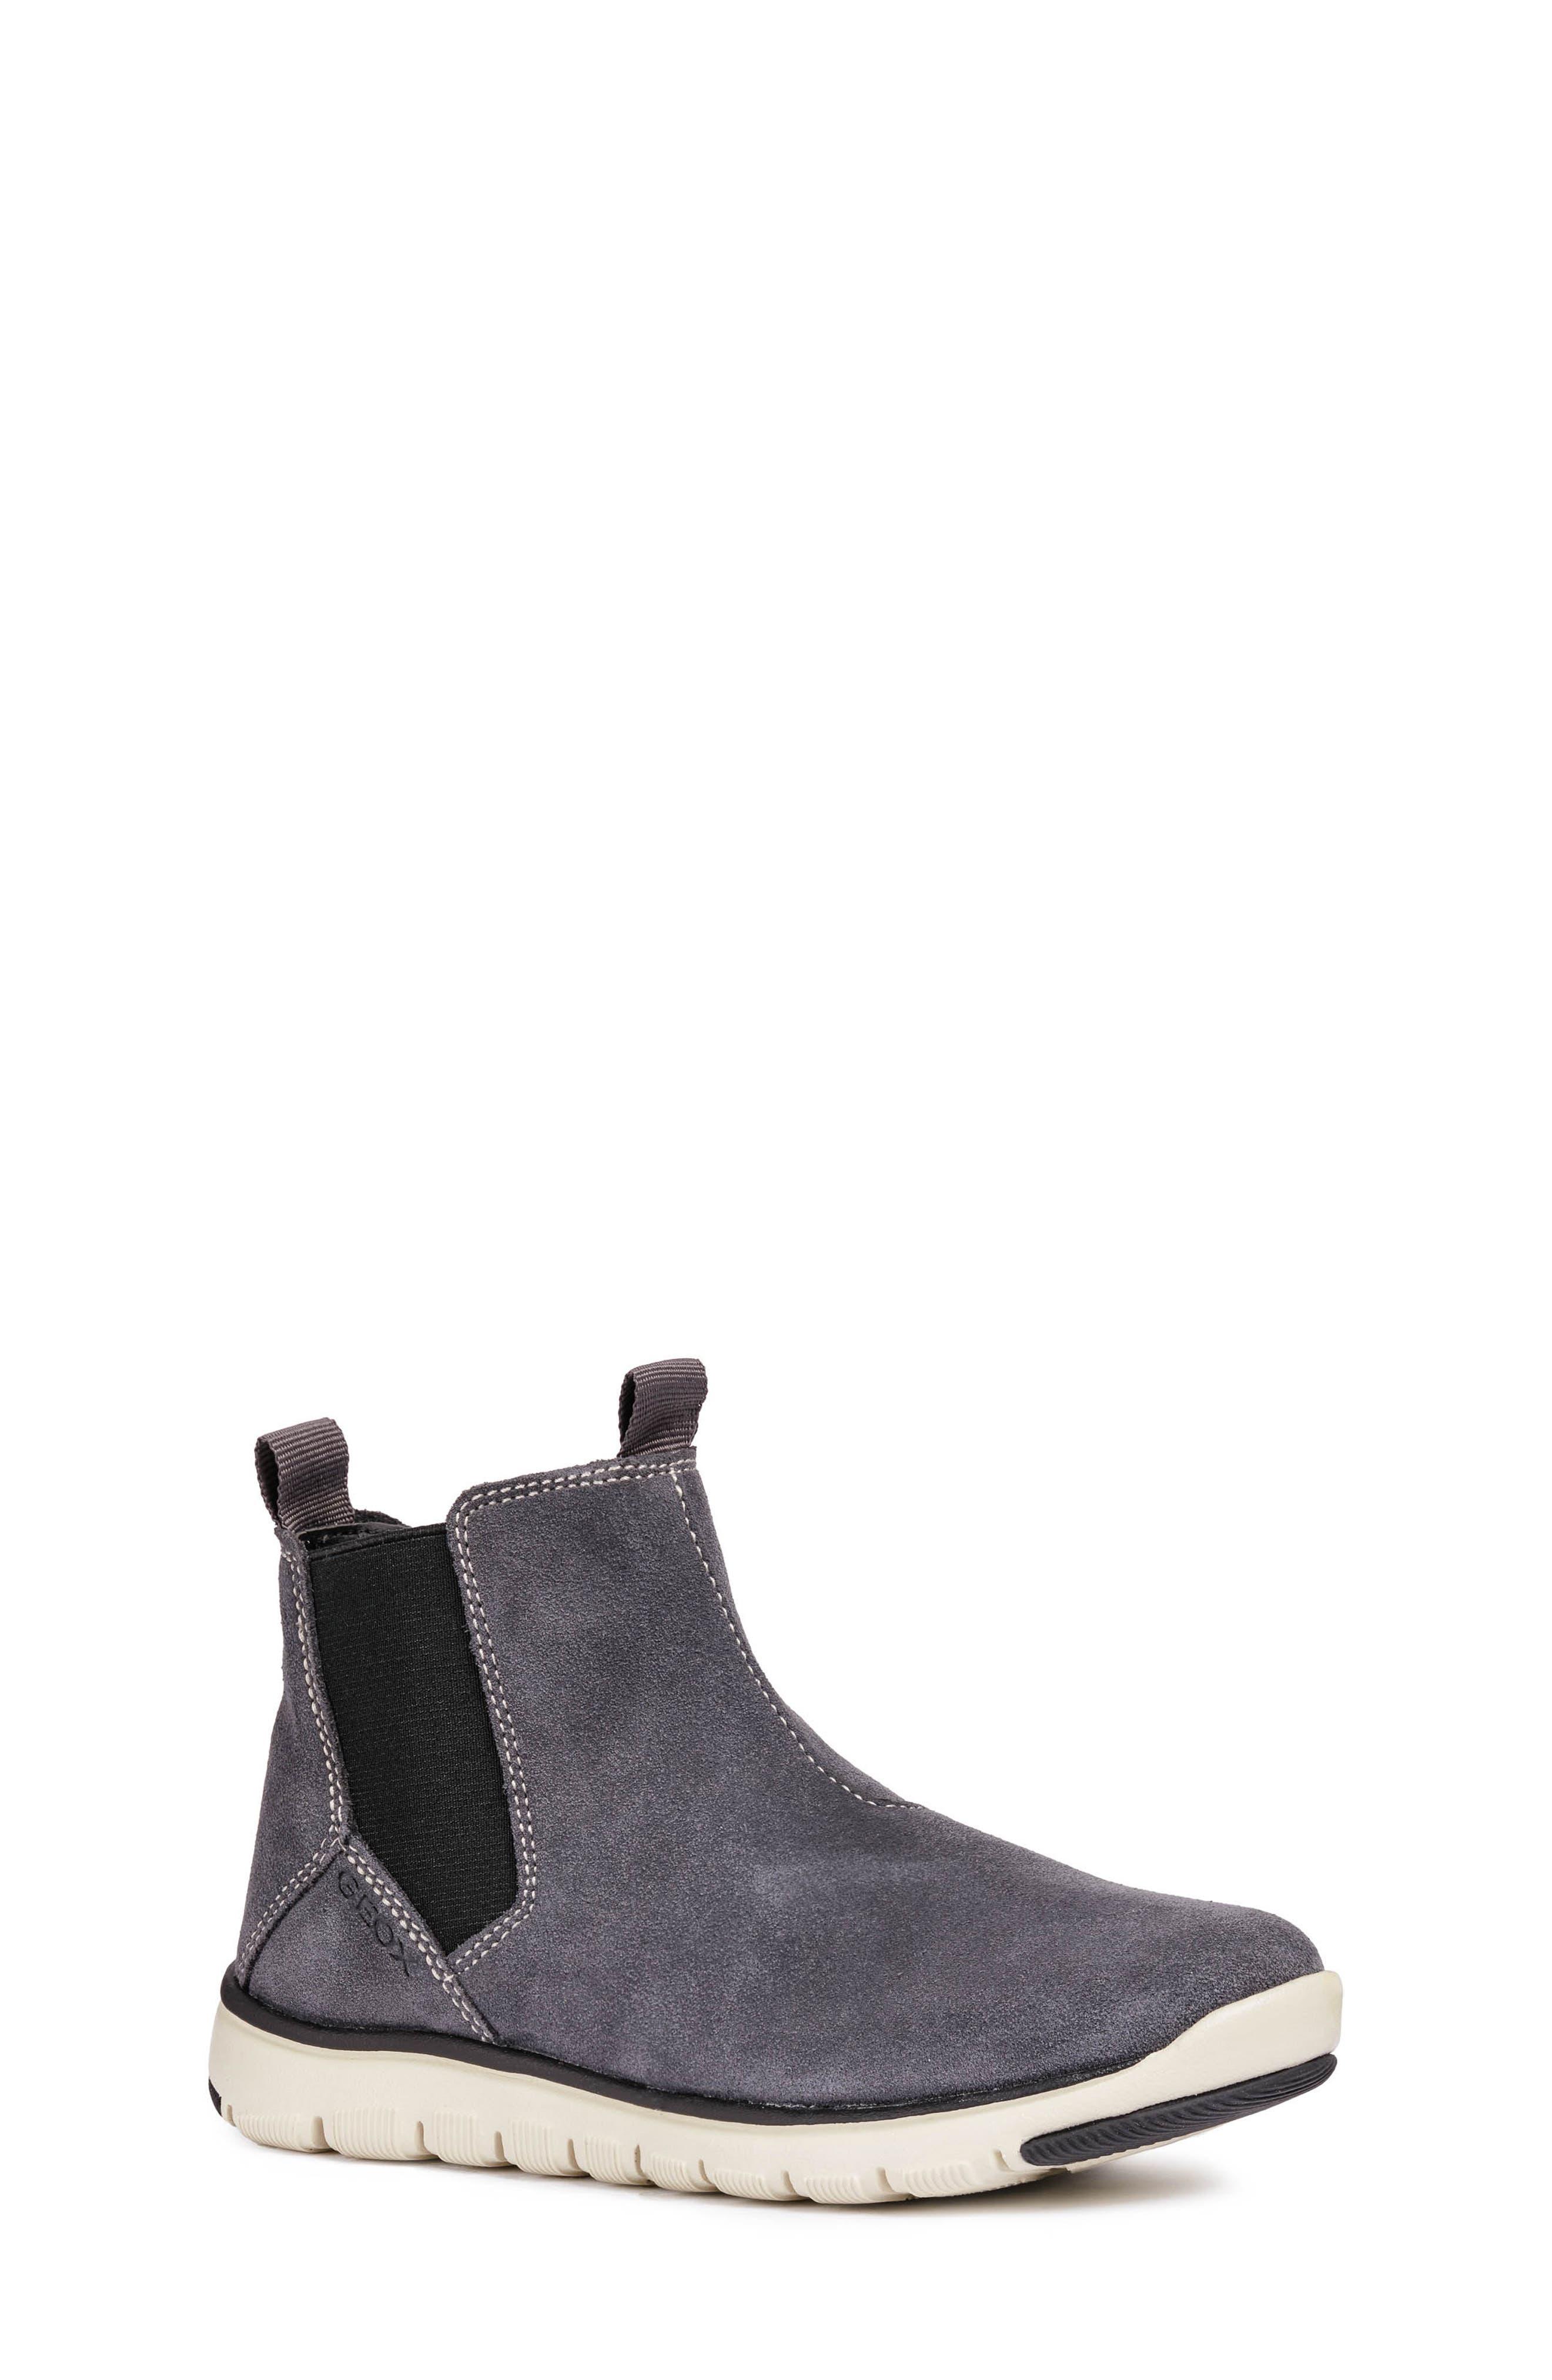 Xunday Boot,                         Main,                         color, DARK GREY